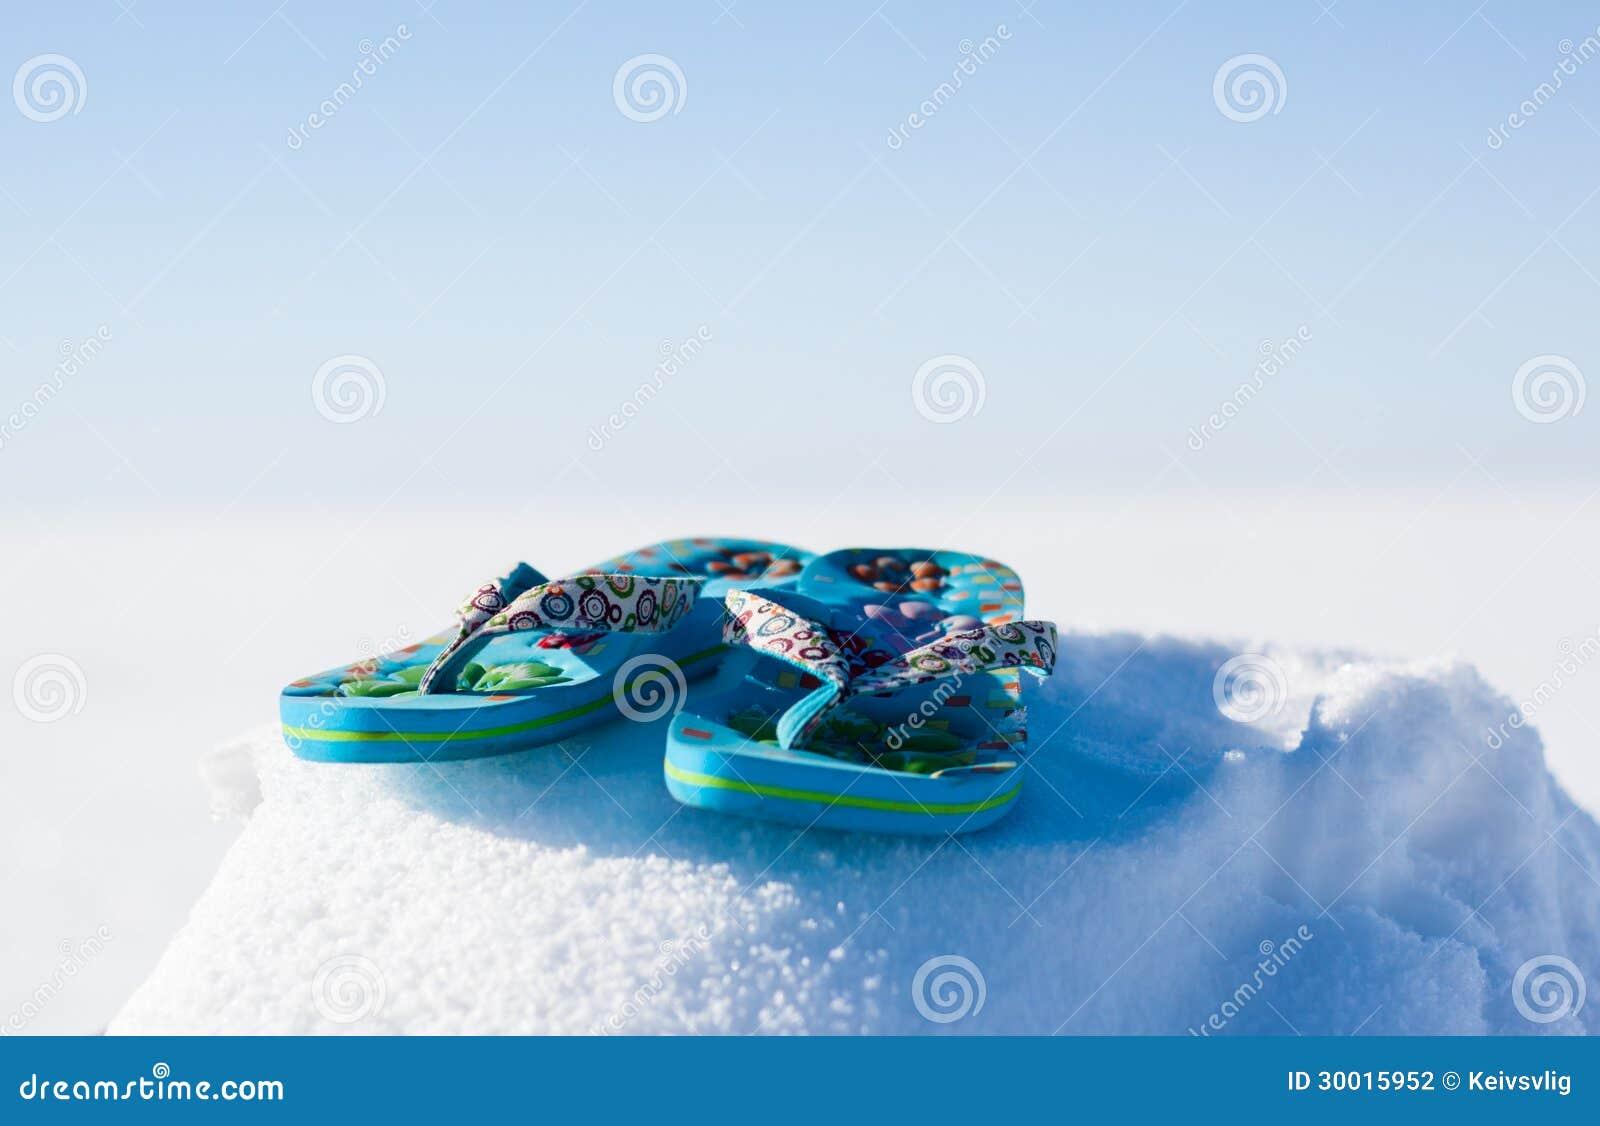 1a5474f781dc7 Flip flops snow stock photo. Image of blue